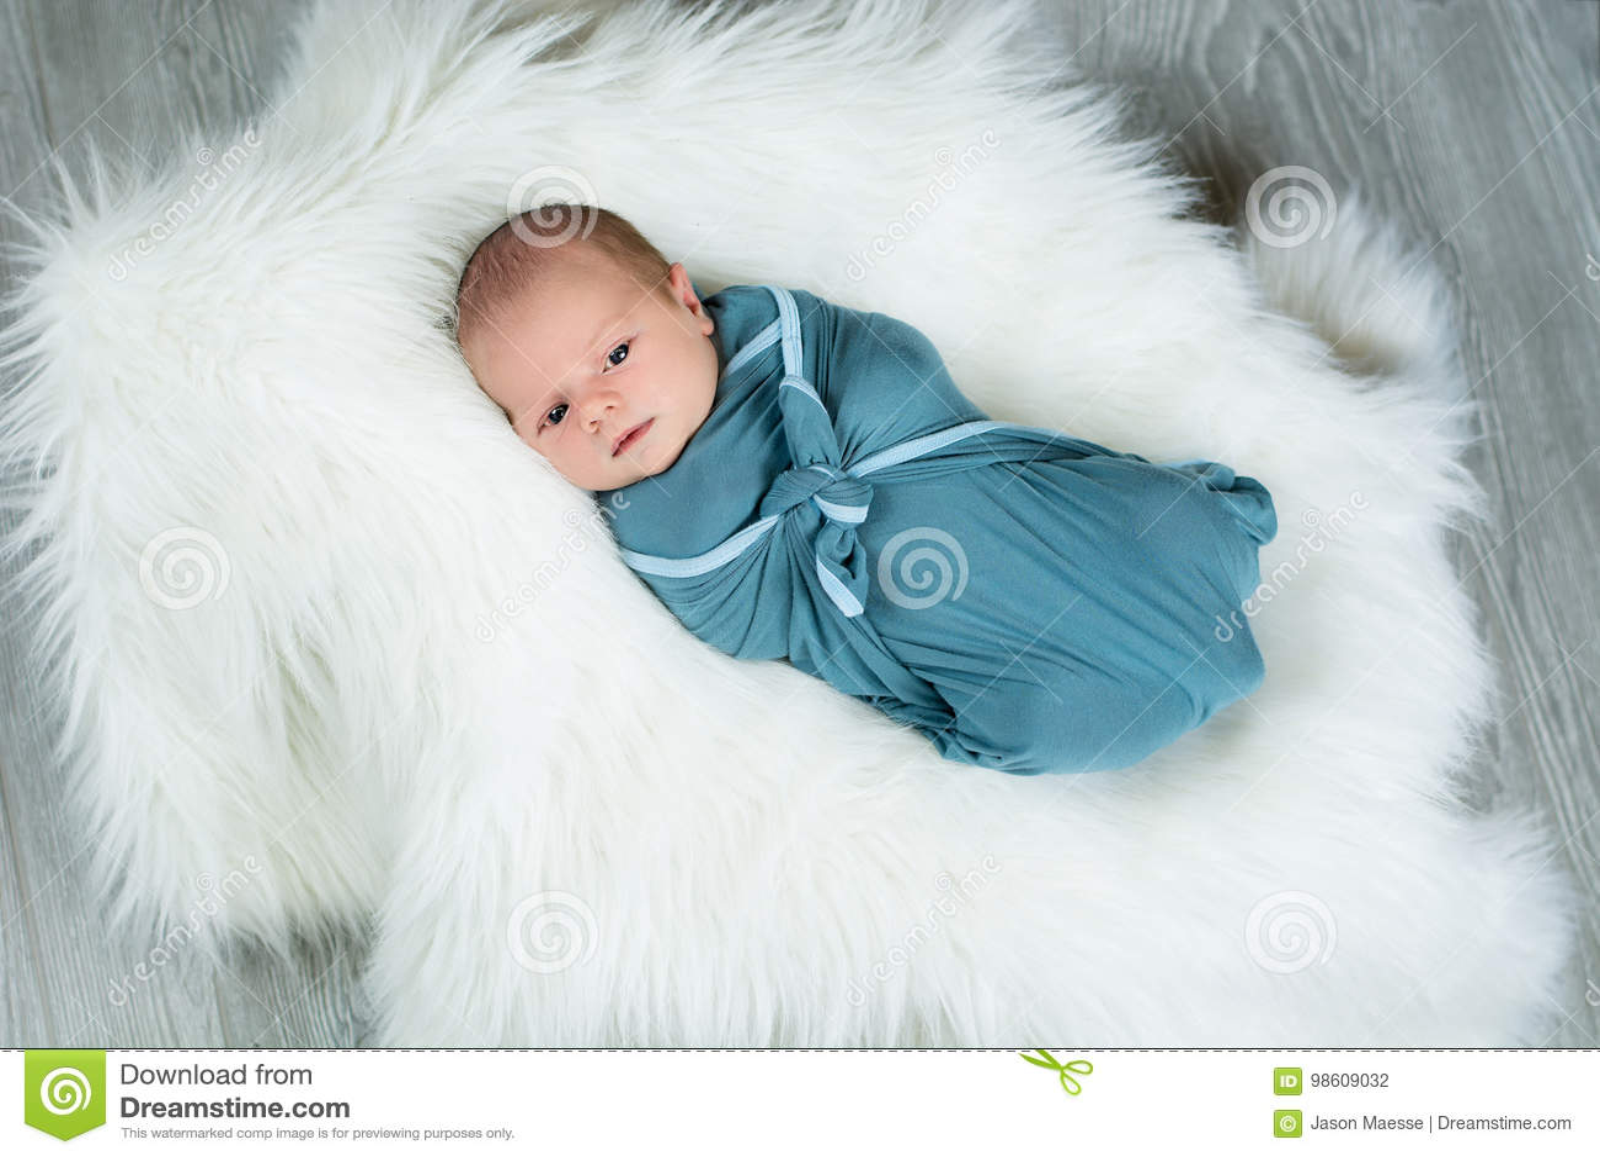 cebee44cba73 Newborn baby boy stock photo. Image of innocent